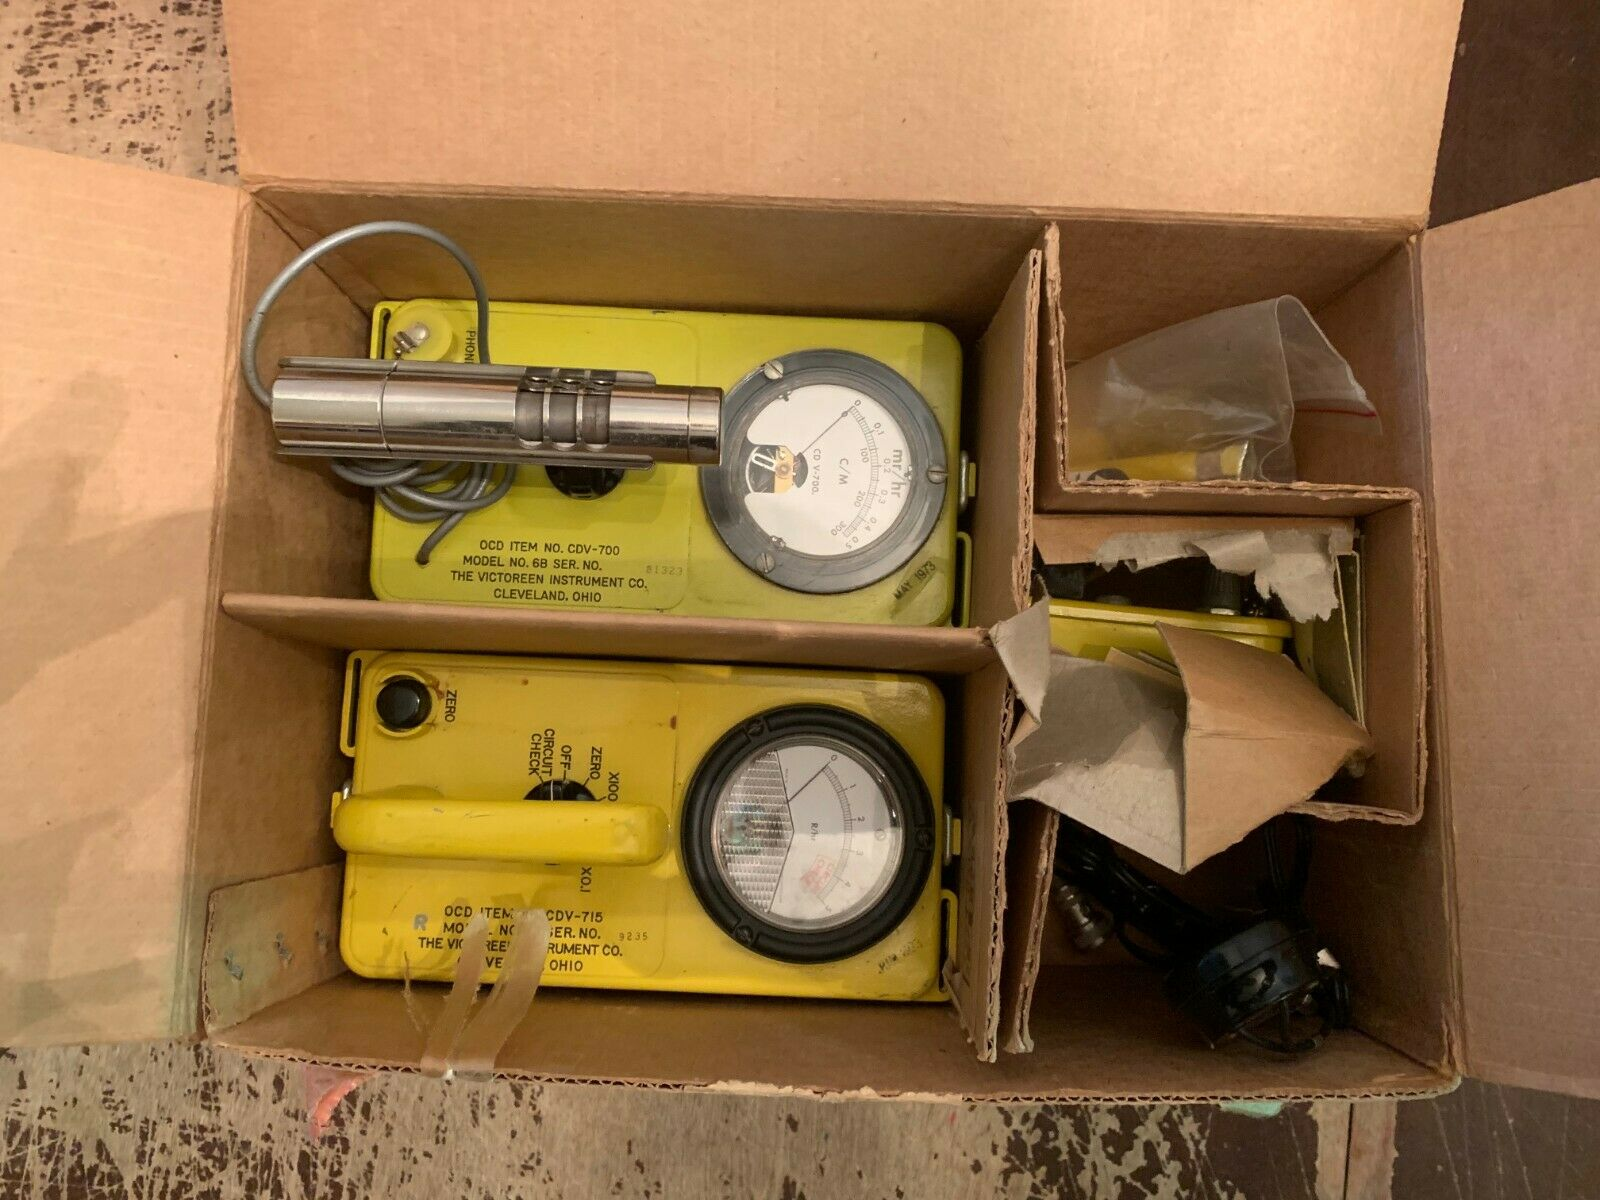 s l1600 - 1973 Civil Defense CD V-777-1 Radiation Detection Set and Original Box Geiger